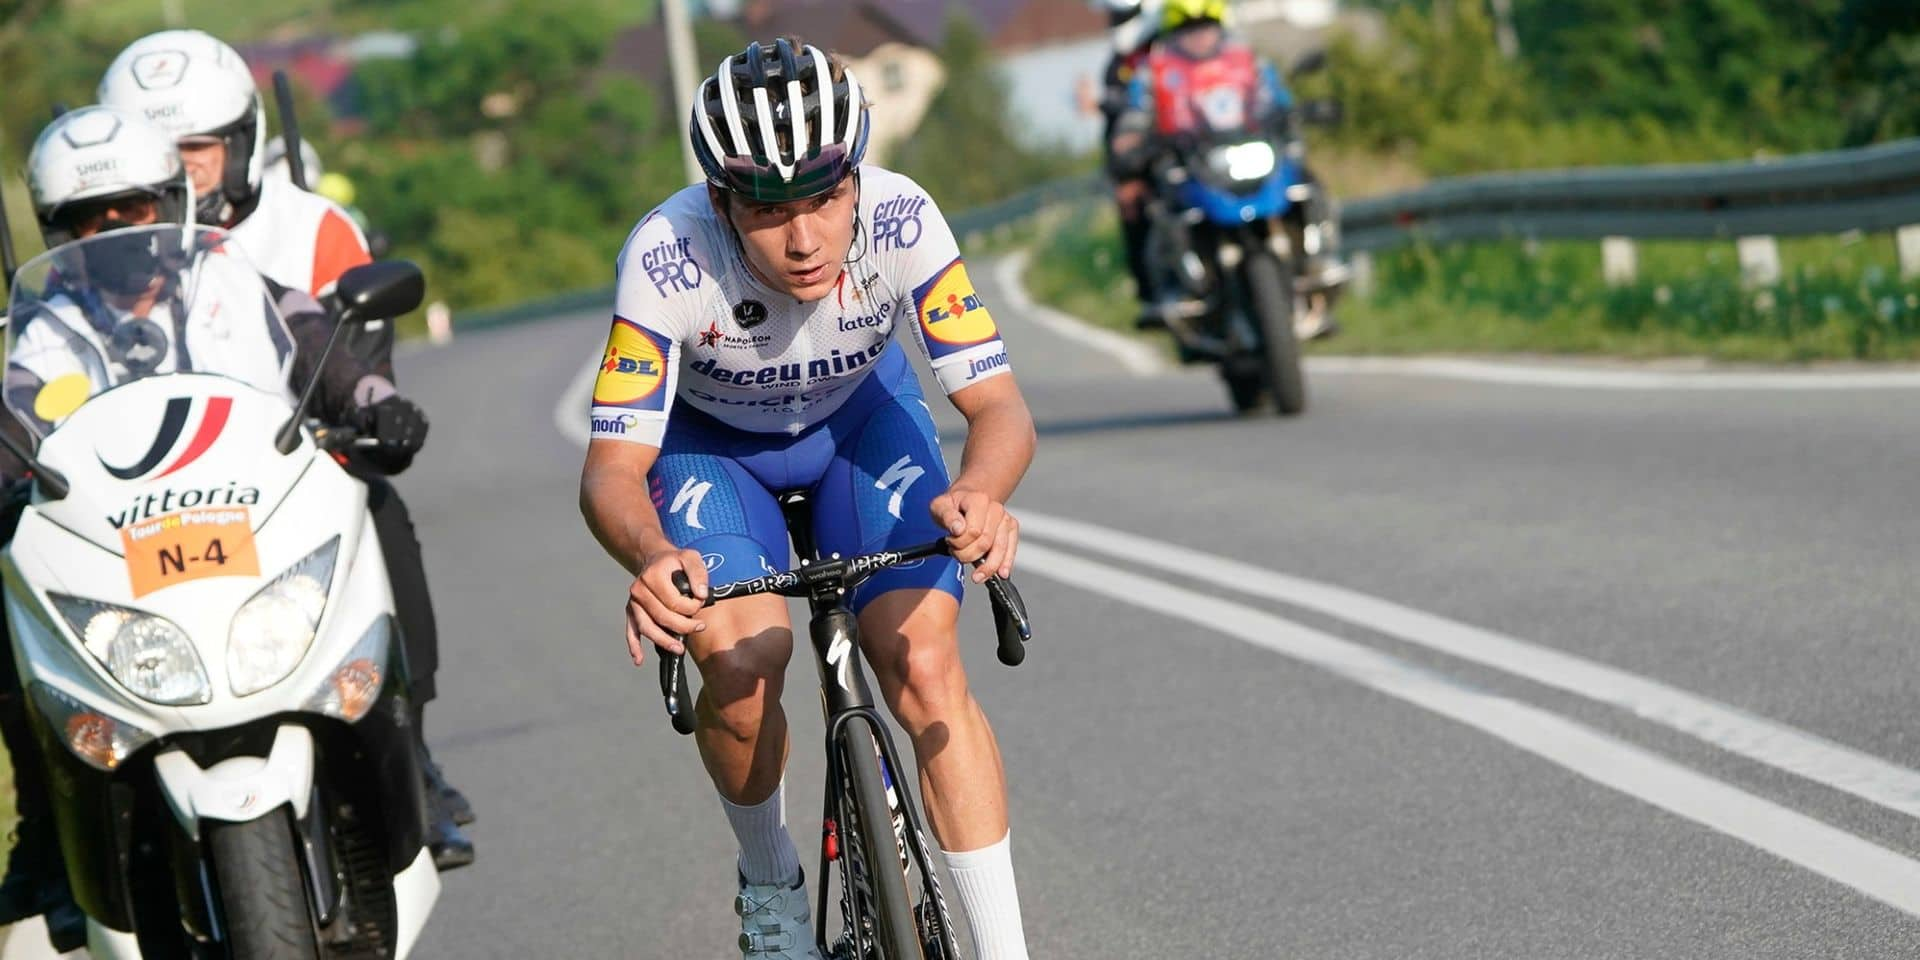 Remco Evenepoel prolonge son contrat avec Deceuninck-Quick Step jusqu'en 2026 !